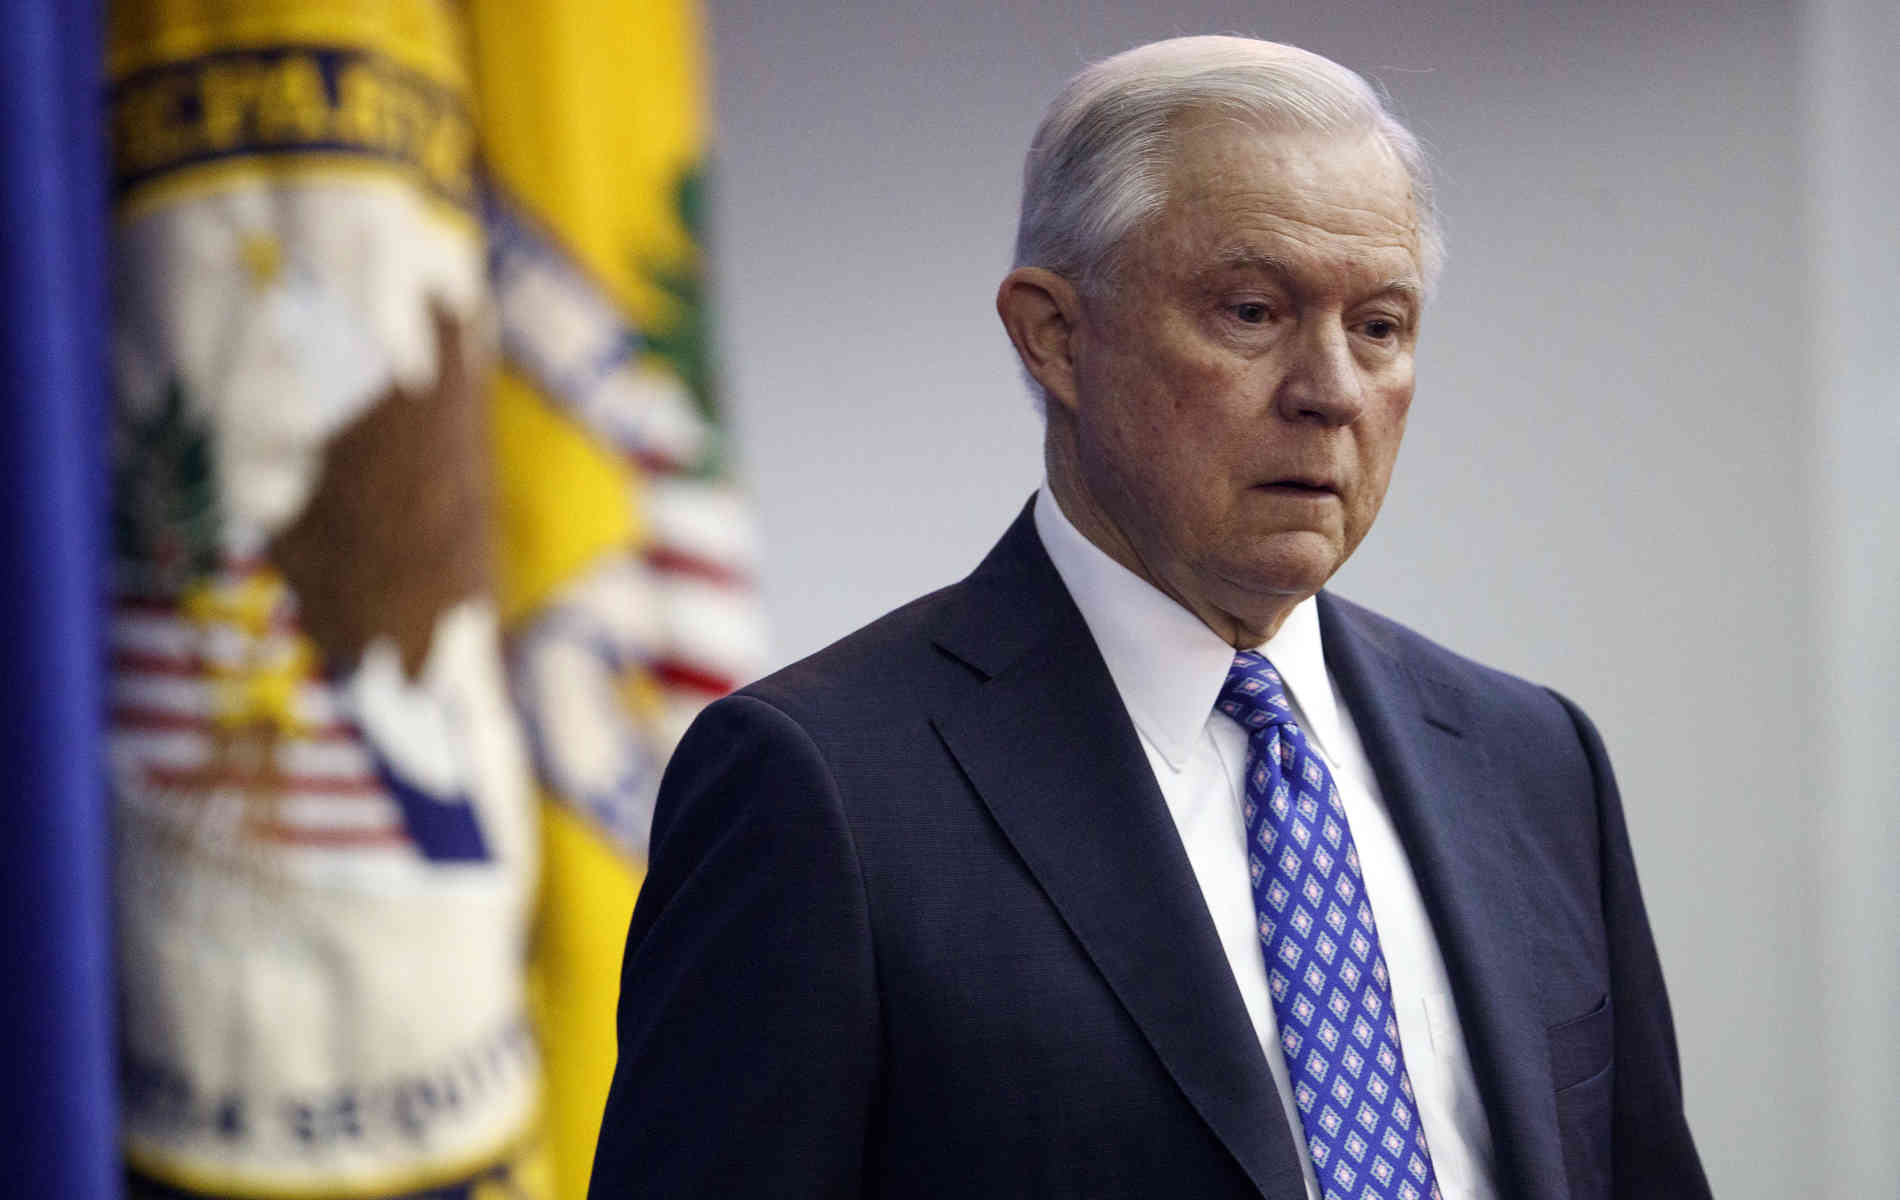 Sessions verlässt Posten als Justizminister - Brennpunkte